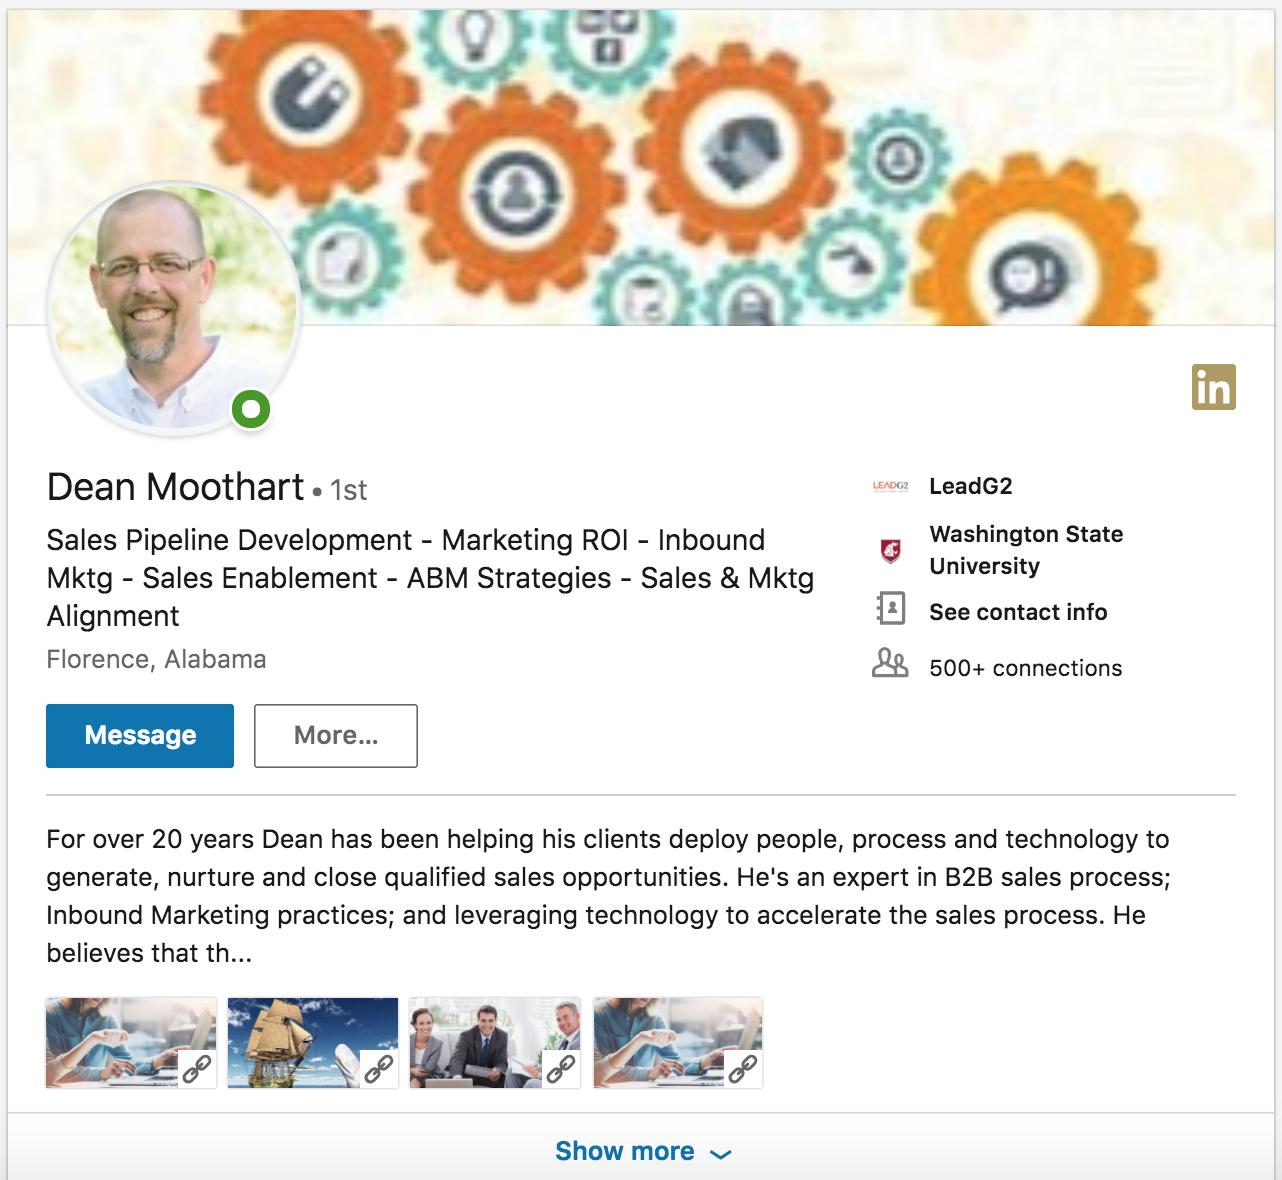 Dean Moothart LinkedIn Profile